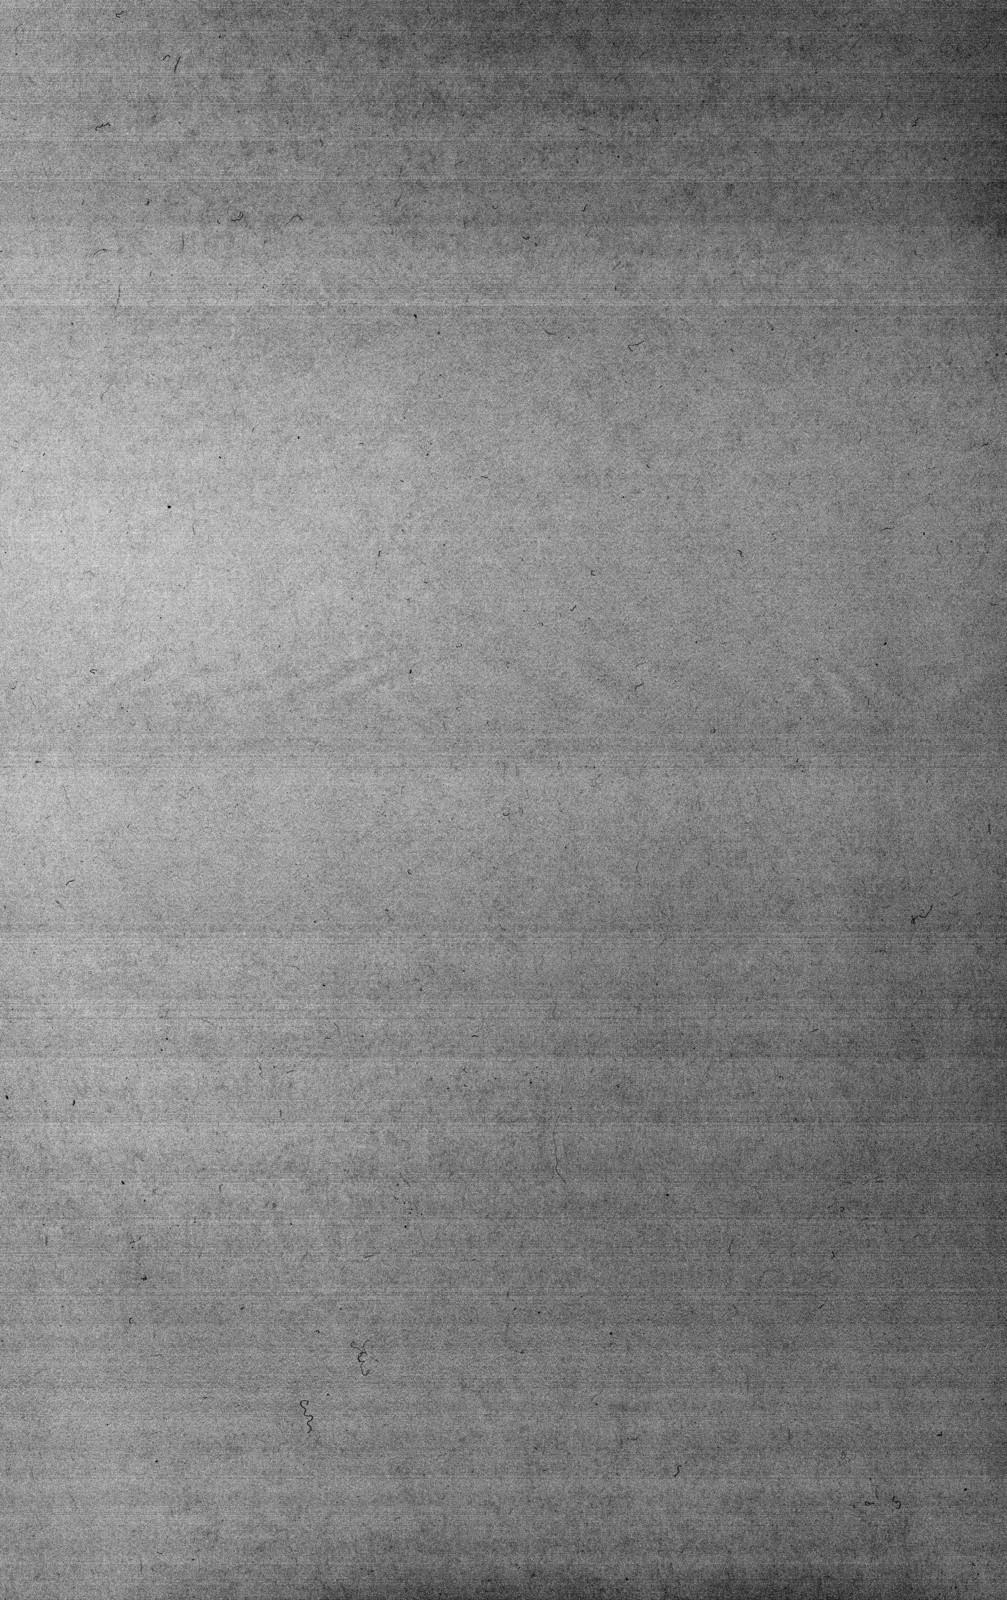 N.W. Ayer & Son's American newspaper annual.1894.Part II.